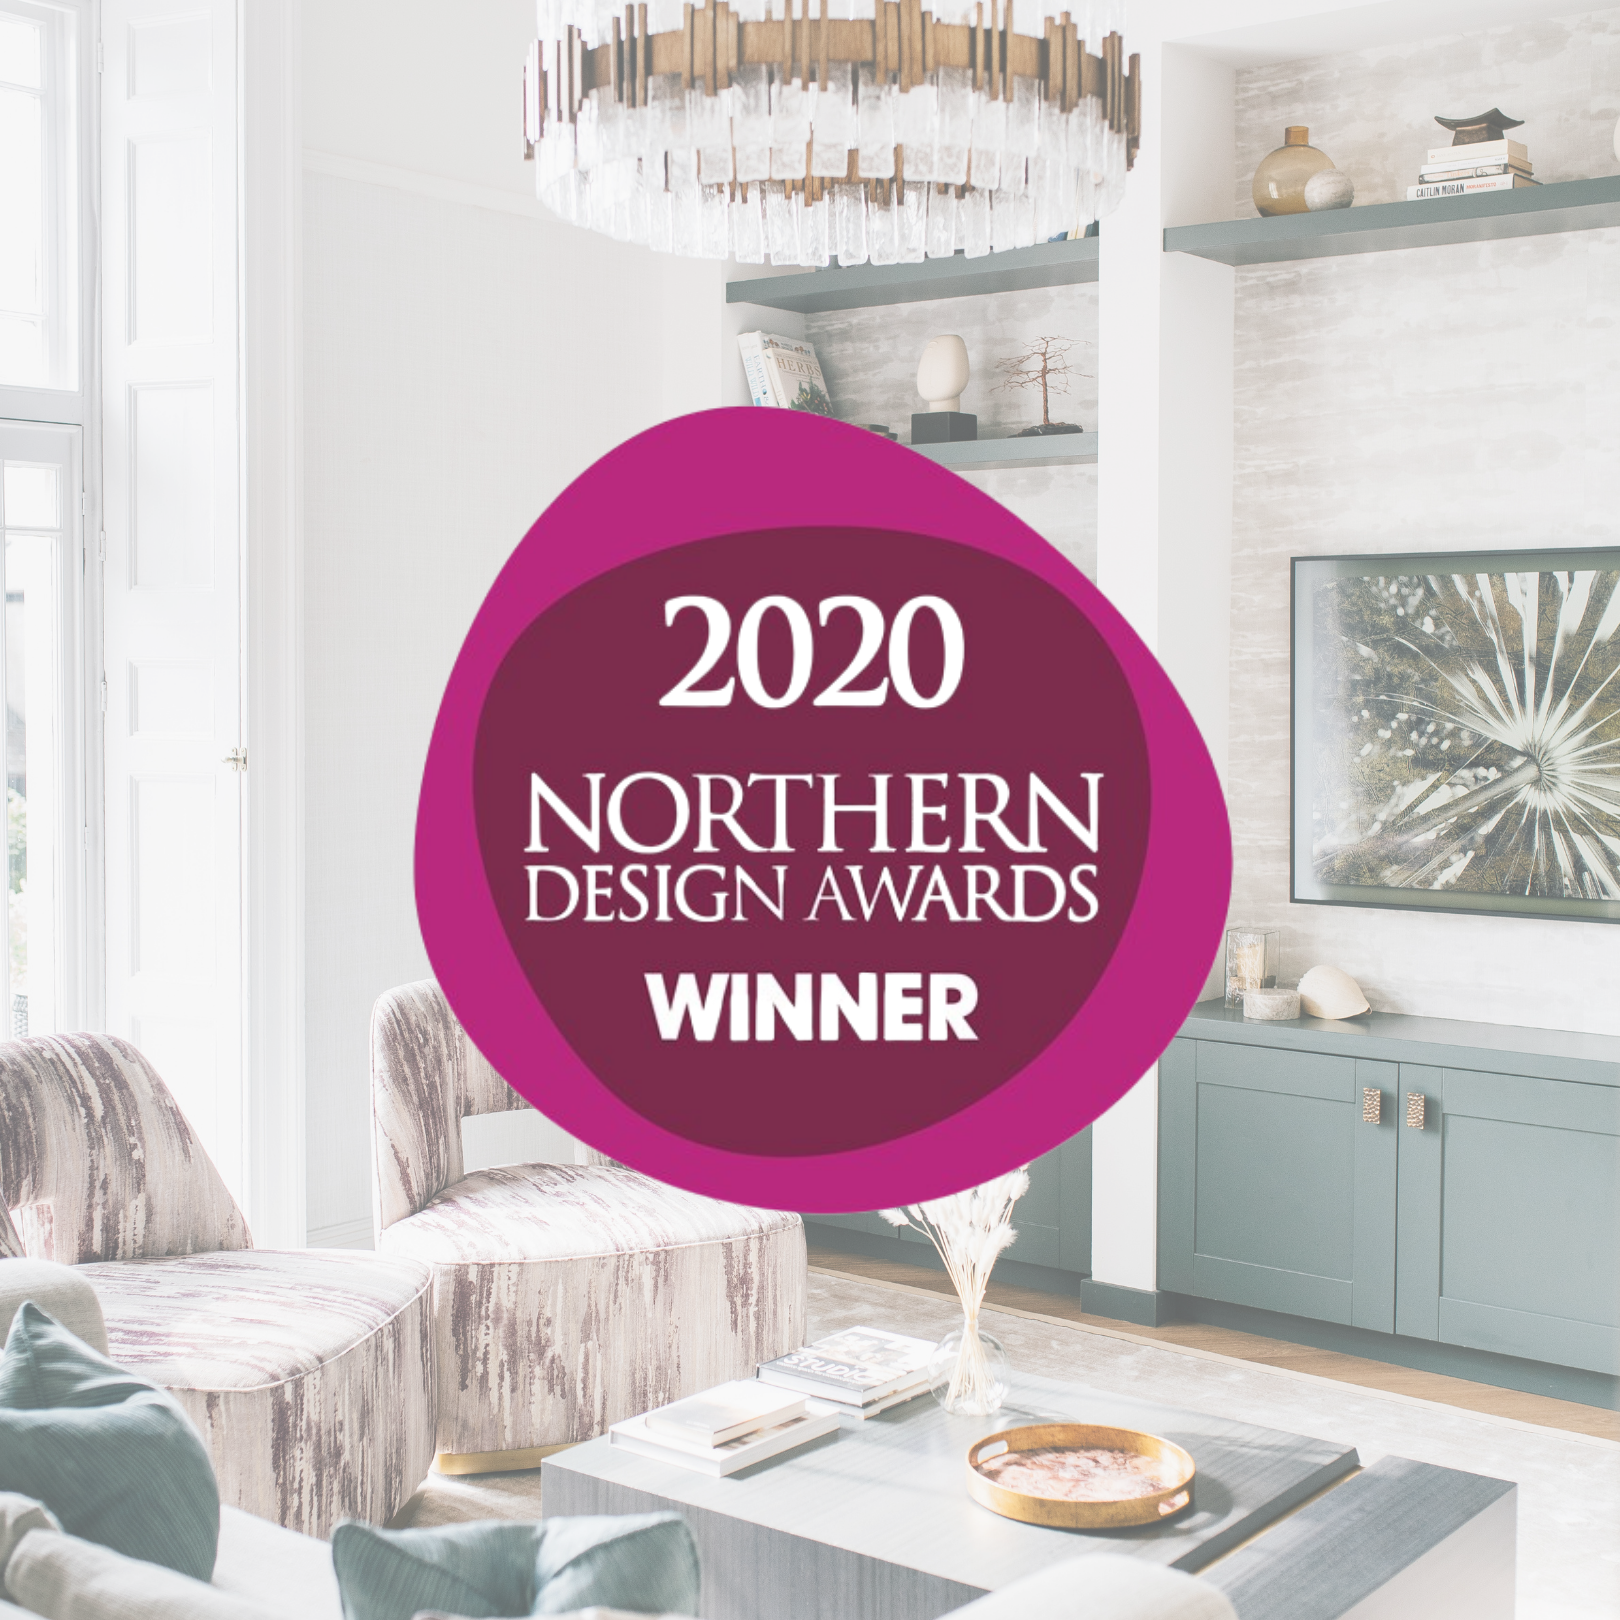 Keyhole Interiors Winners at Northern Design Awards, Interior Design Studio